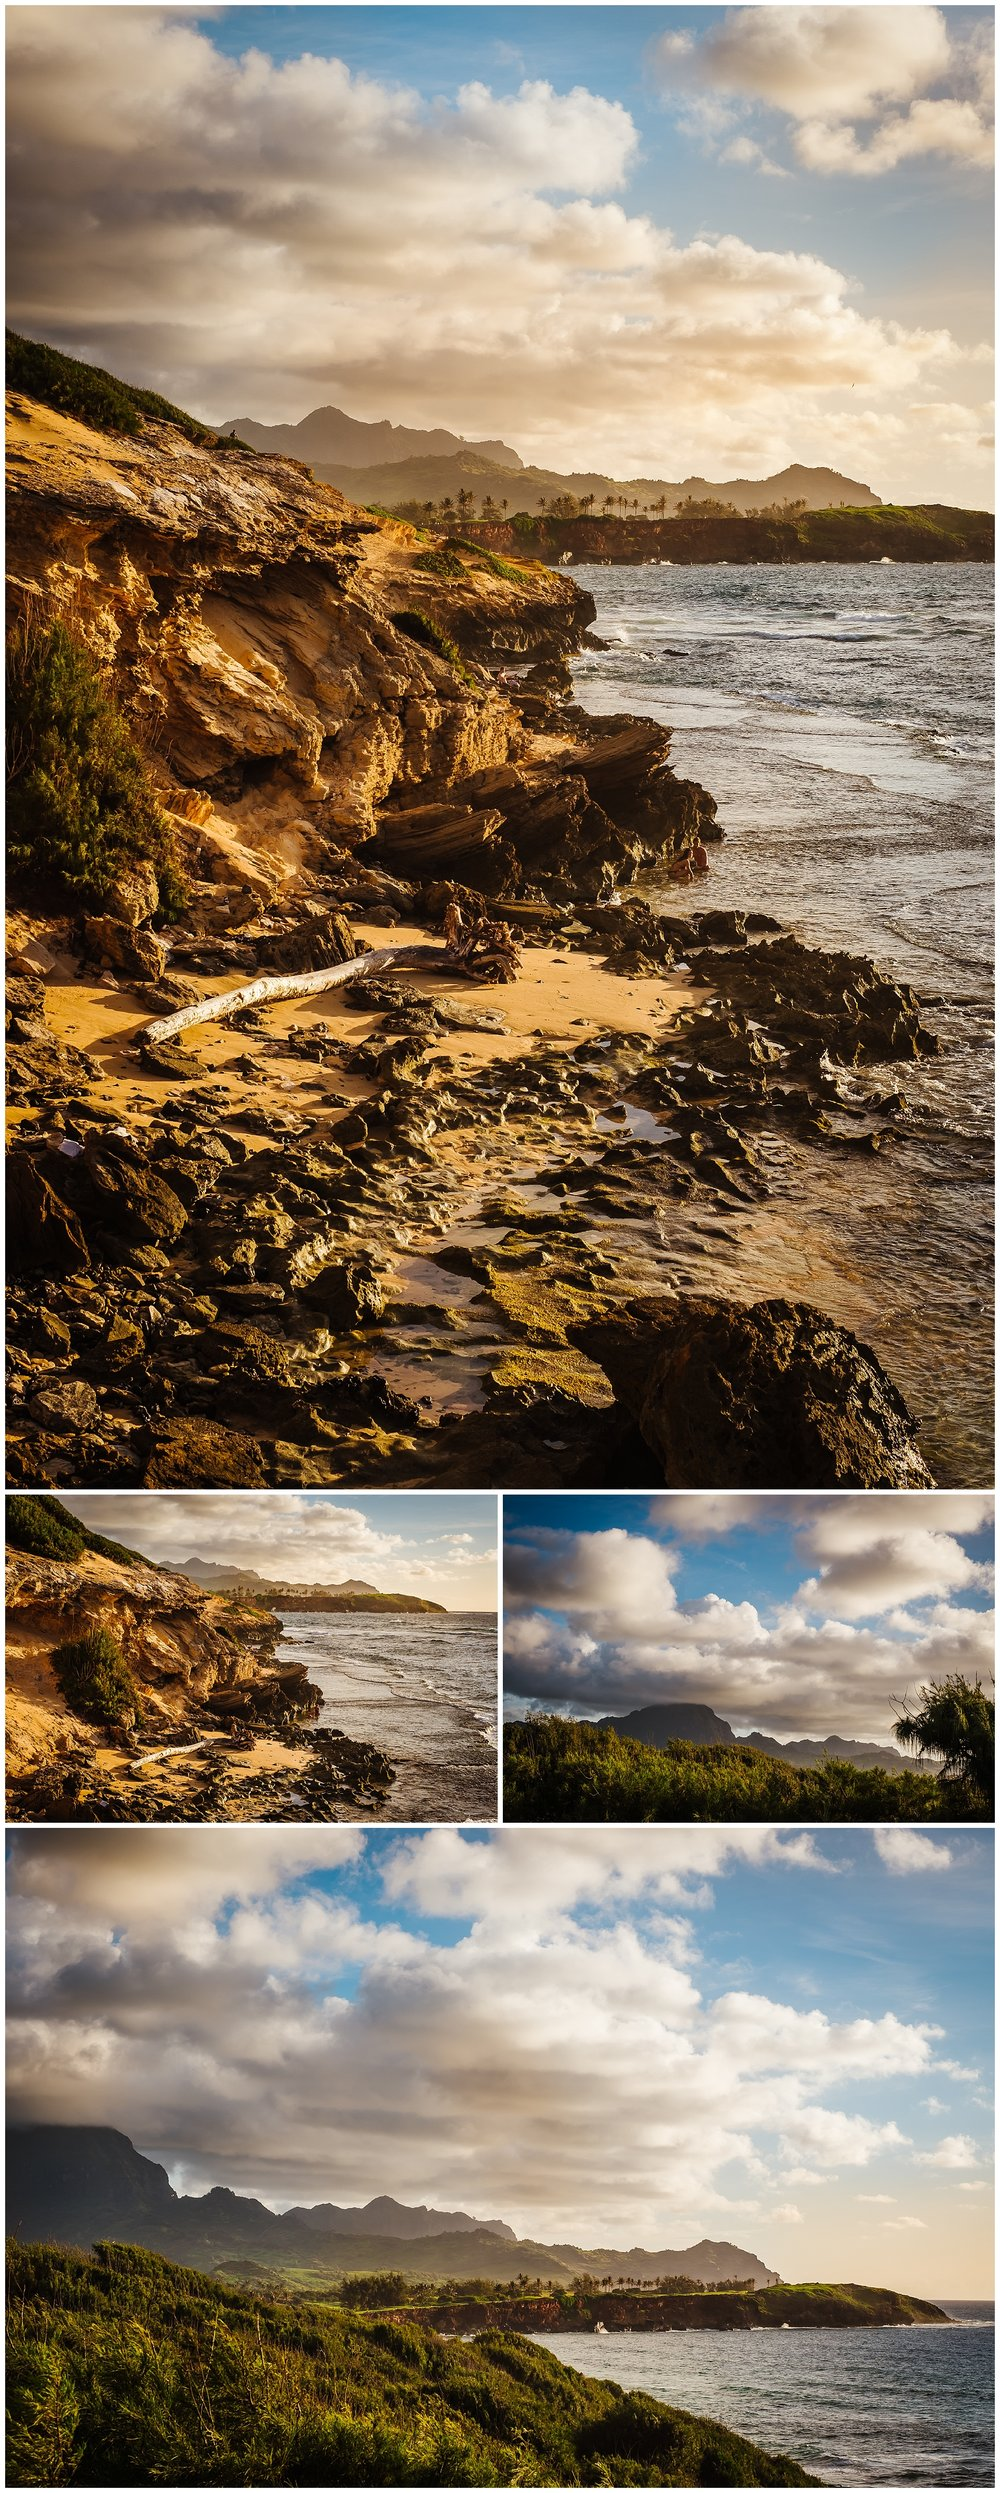 hawaiin-honeymoon-sunrise-portraits-kauai-grand-hystt-destination-photographer_0013.jpg